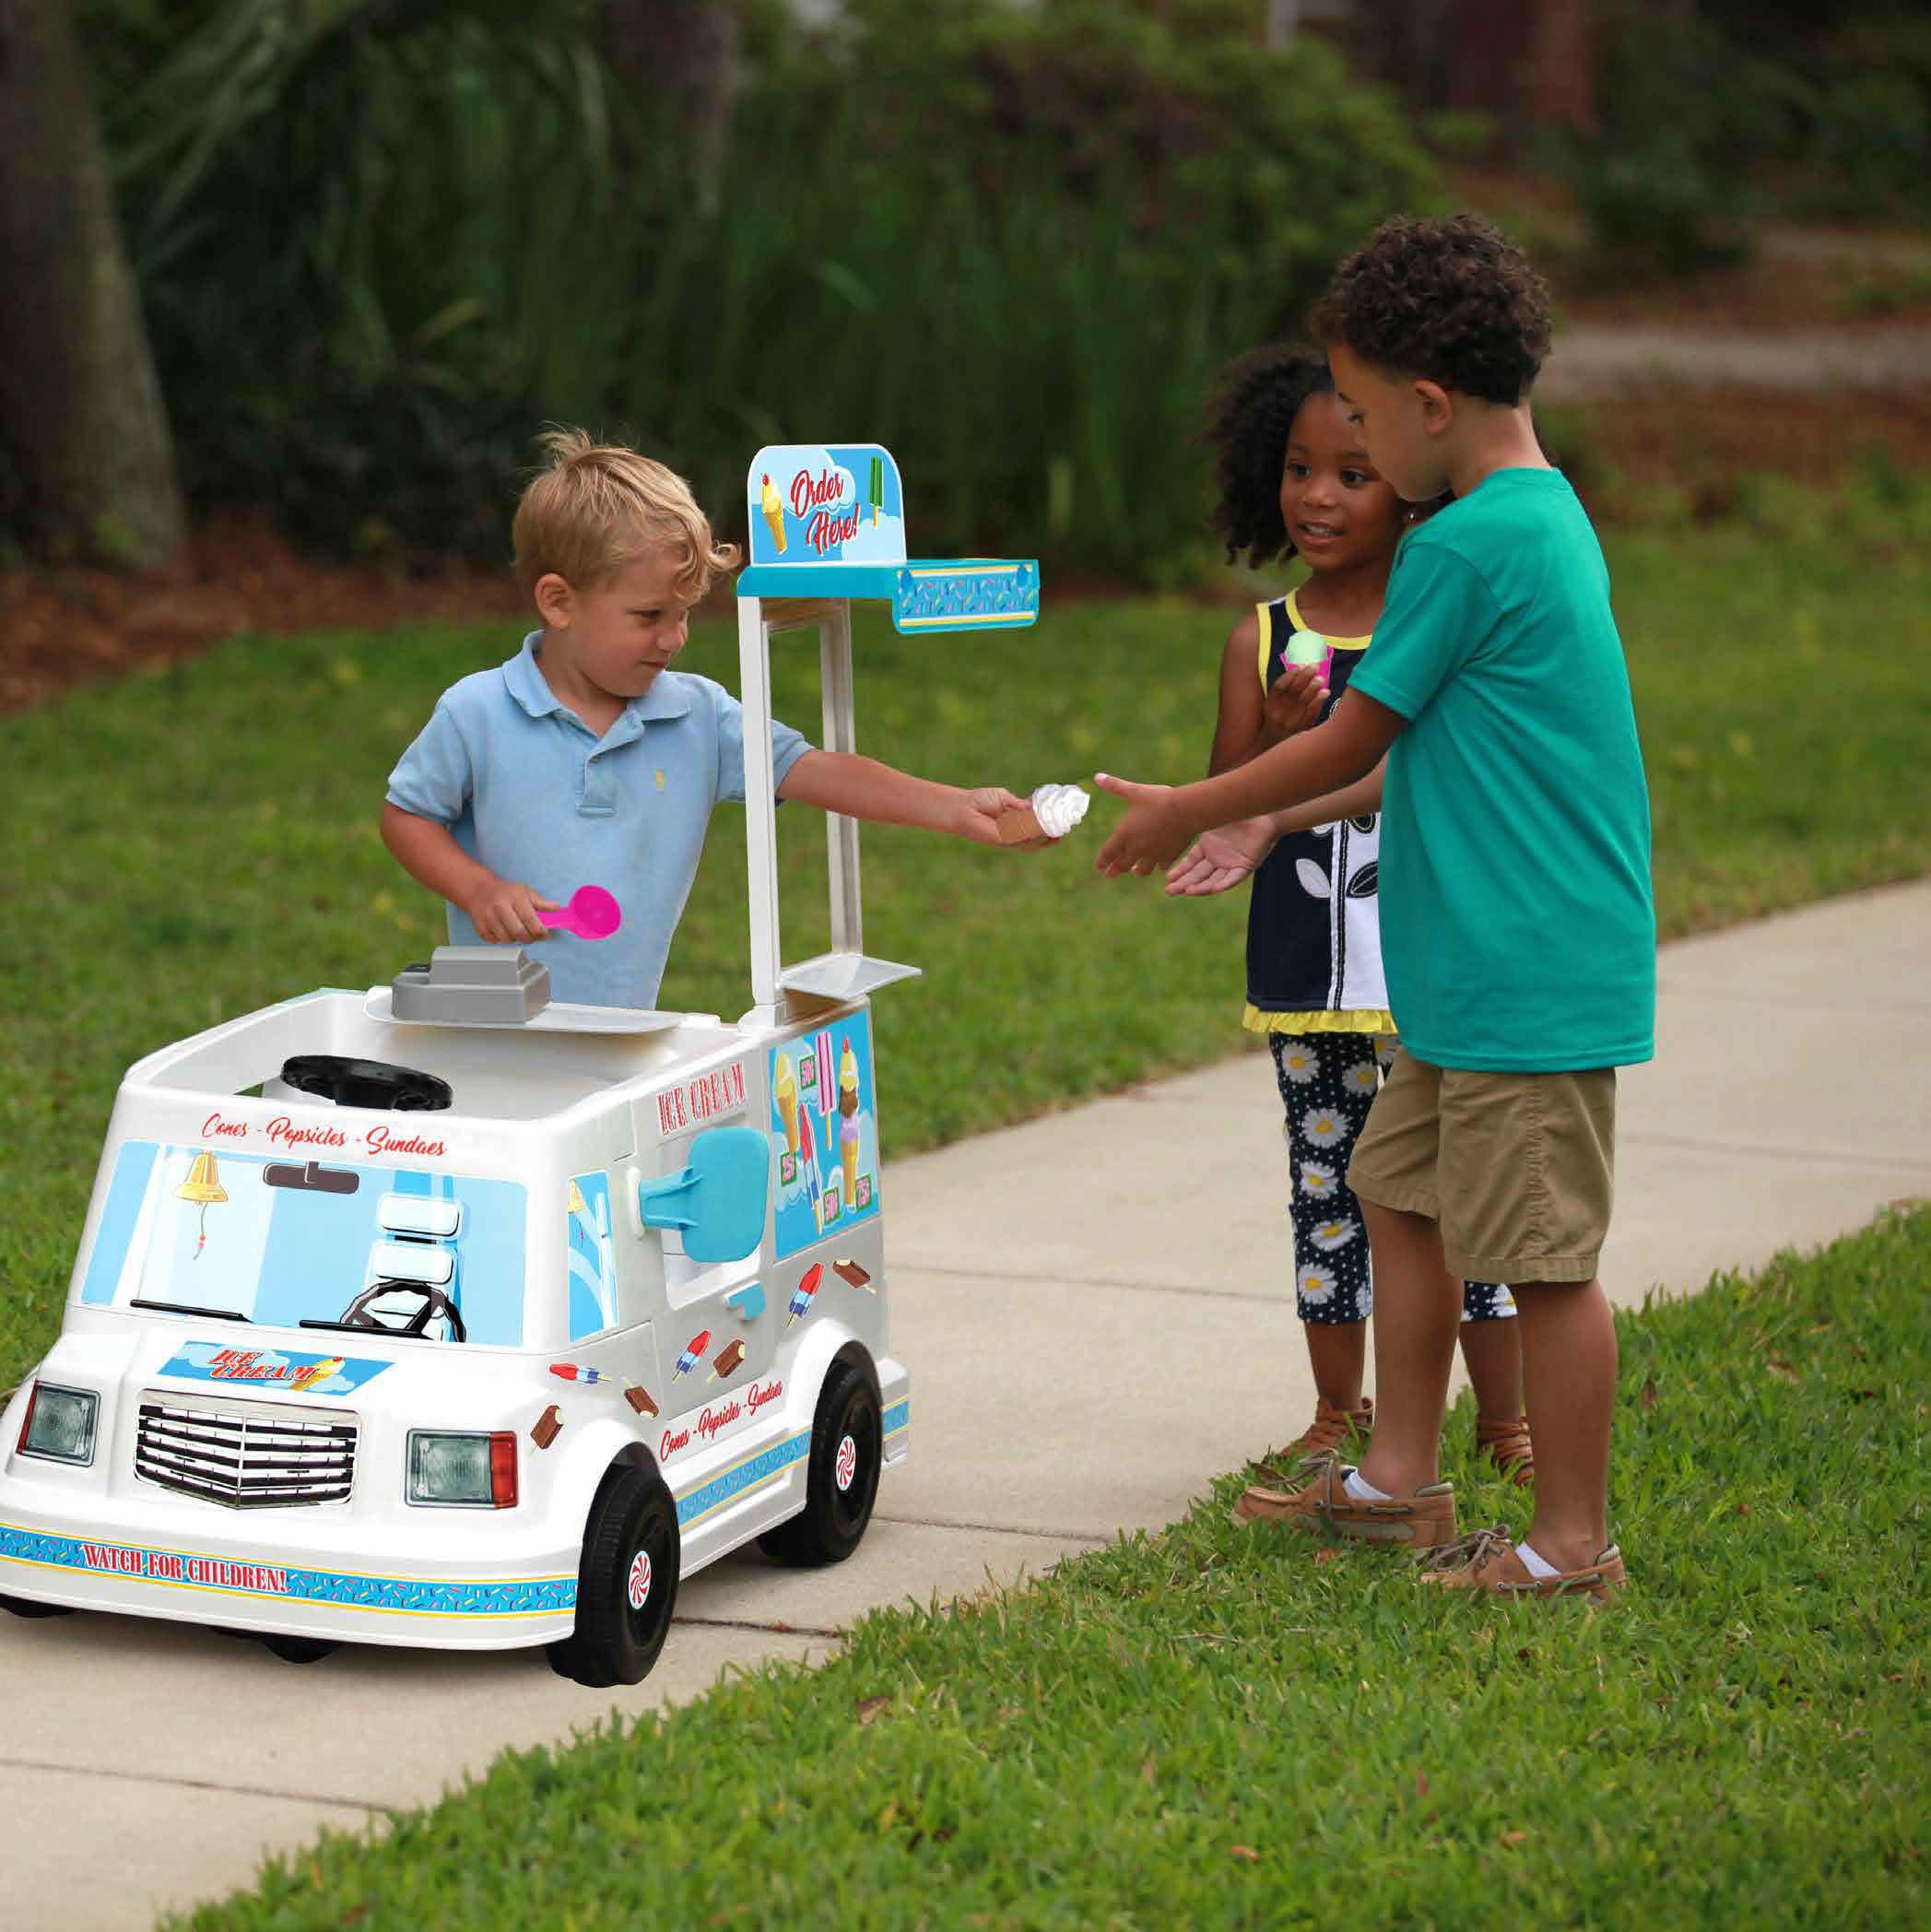 Rollplay 6 Volt EZSteer Ice Cream Truck Ride On Toy, Battery-Powered Kid's Ride On Car